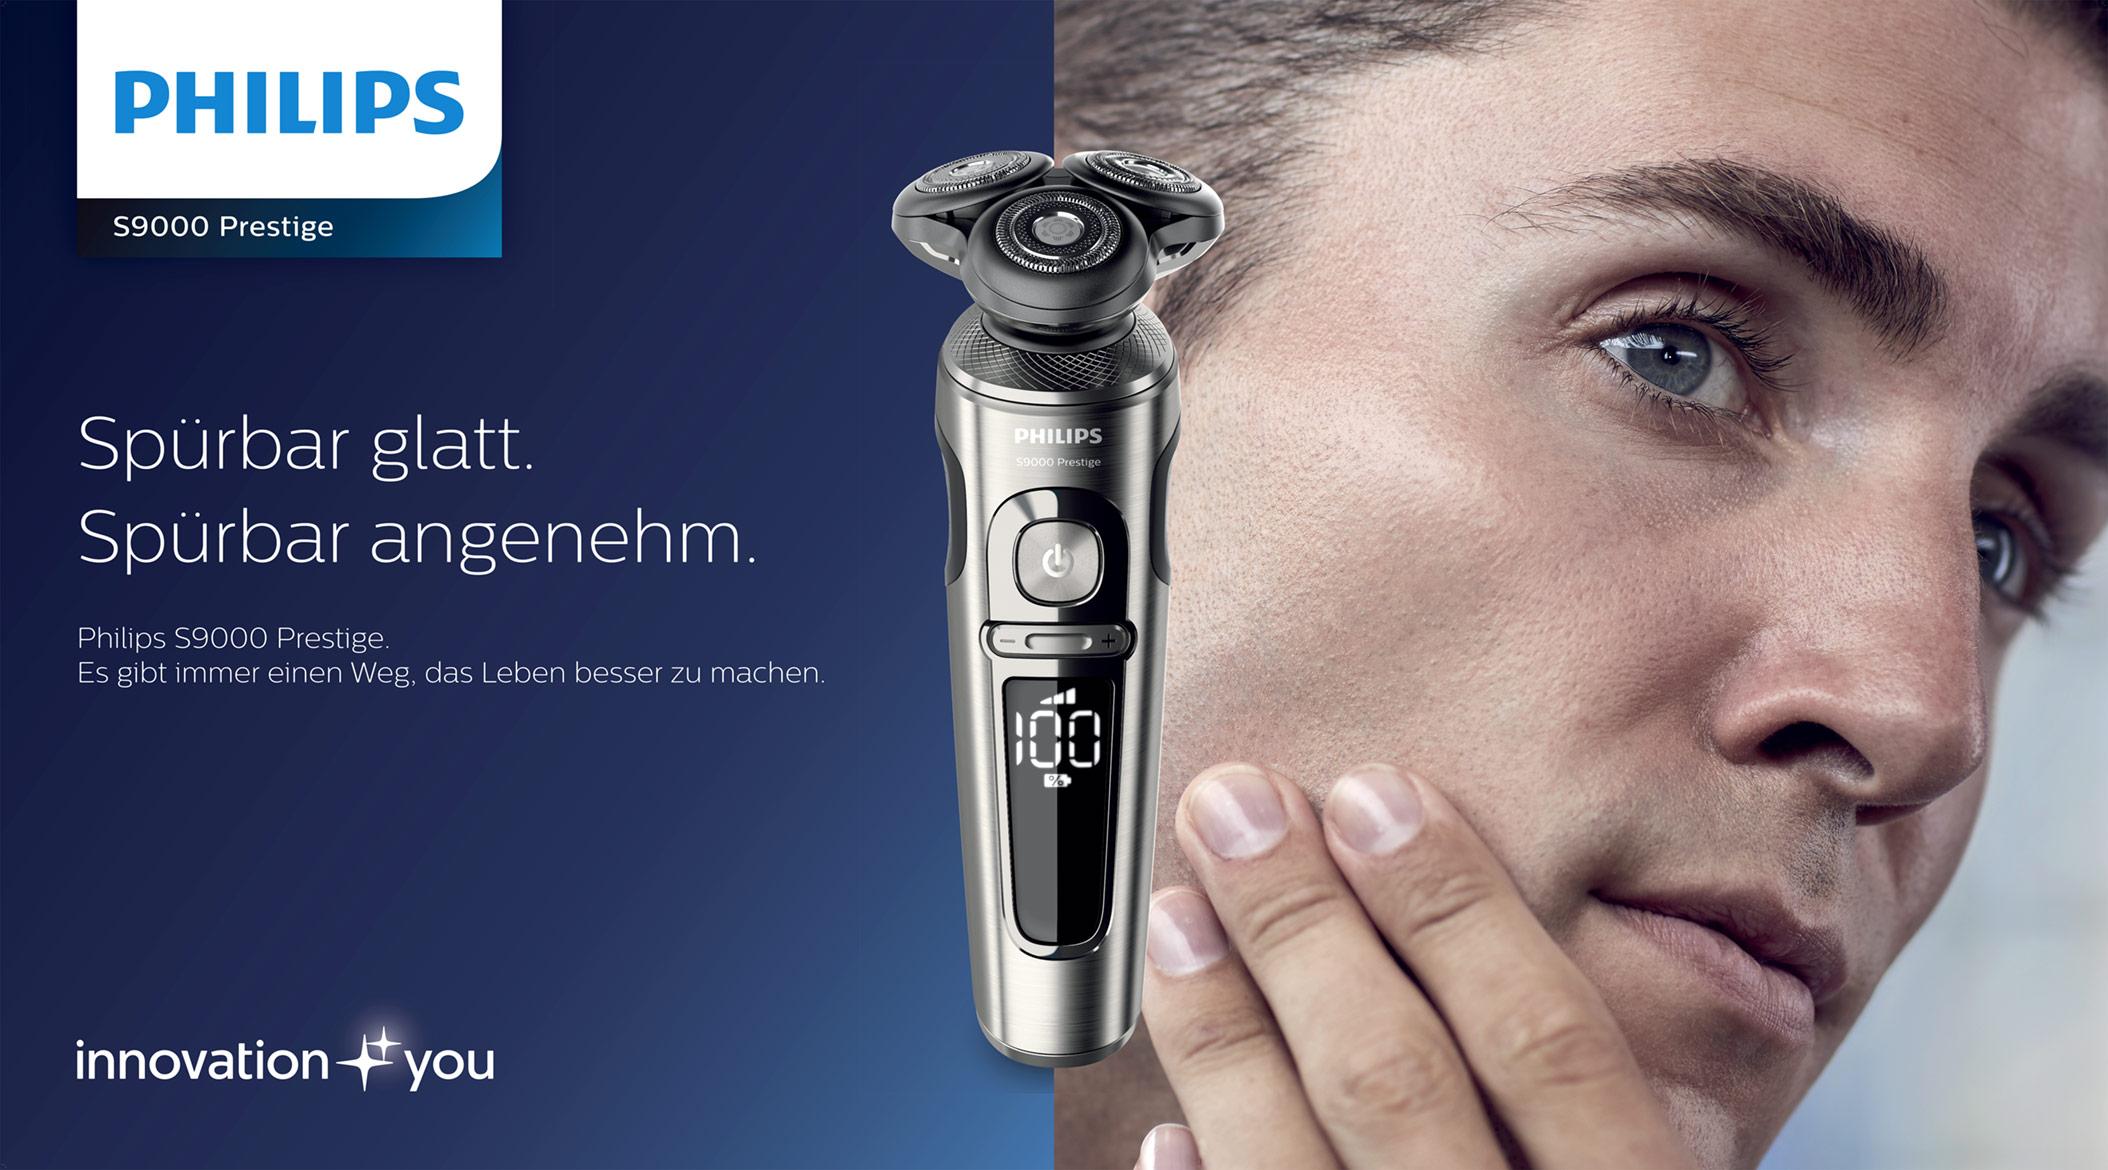 205256273_Philips_IFA_S9000-Prestige_Shaver_2100x3800_HR.jpg